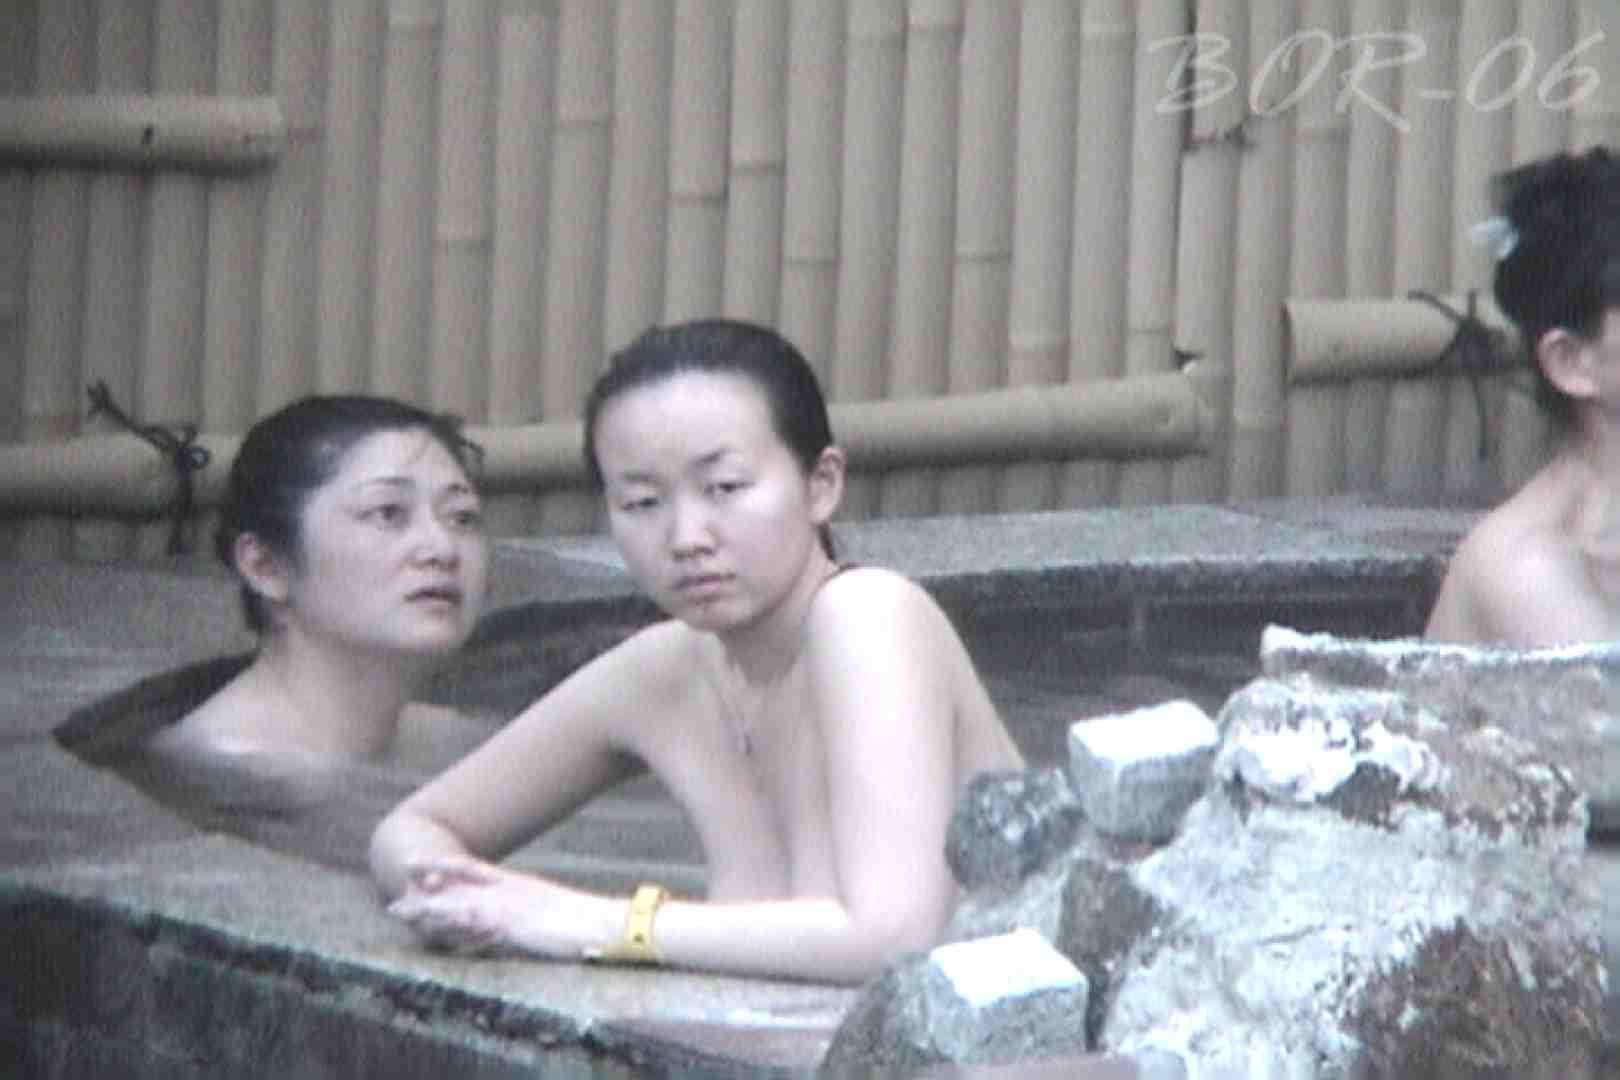 Aquaな露天風呂Vol.519 盗撮師作品  102pic 3